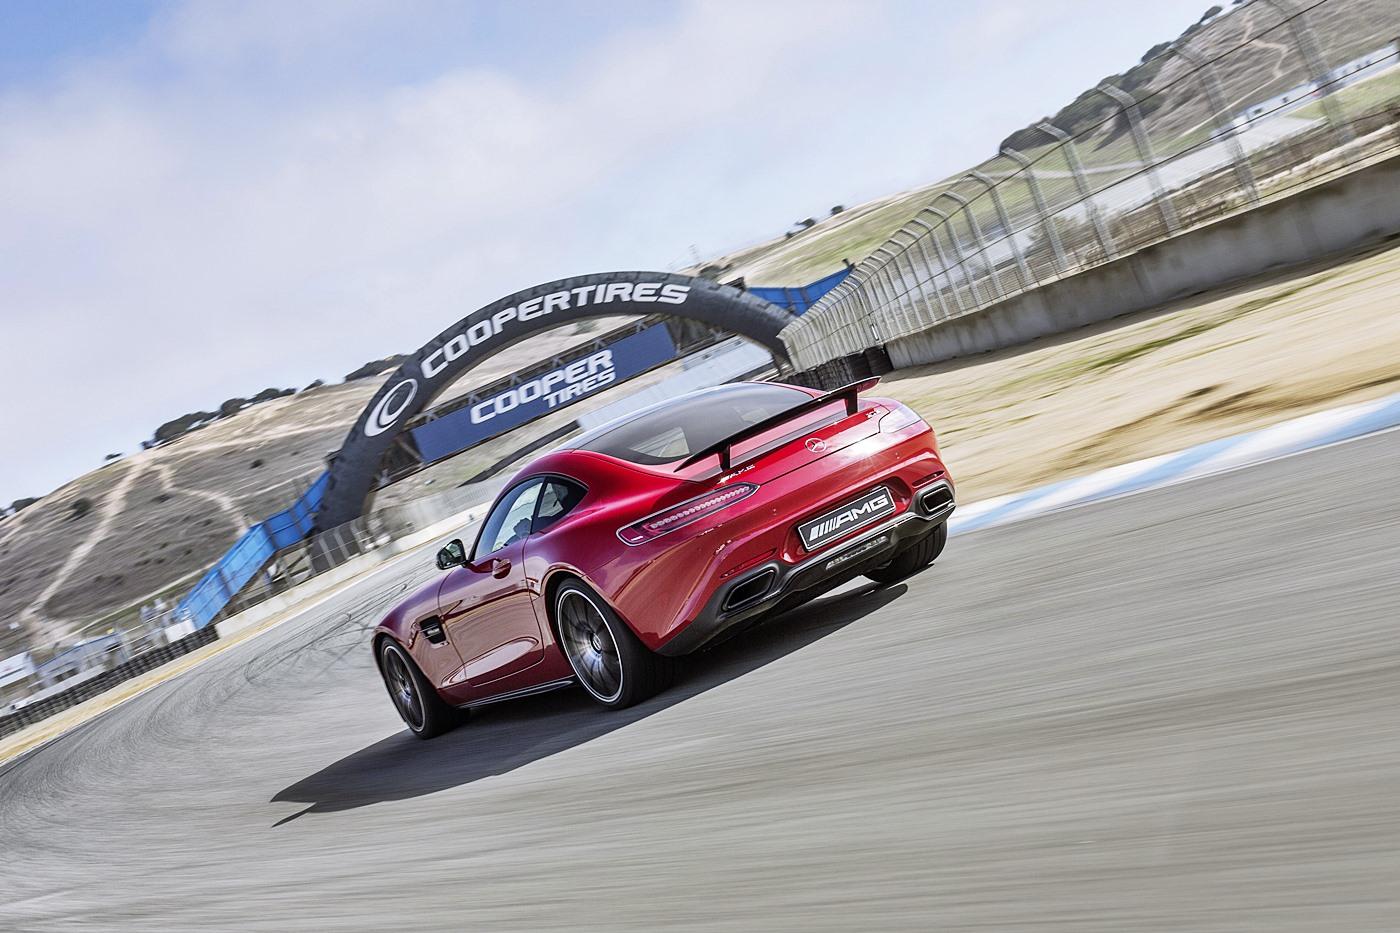 Mercedes-AMG GT S Laguna Seca